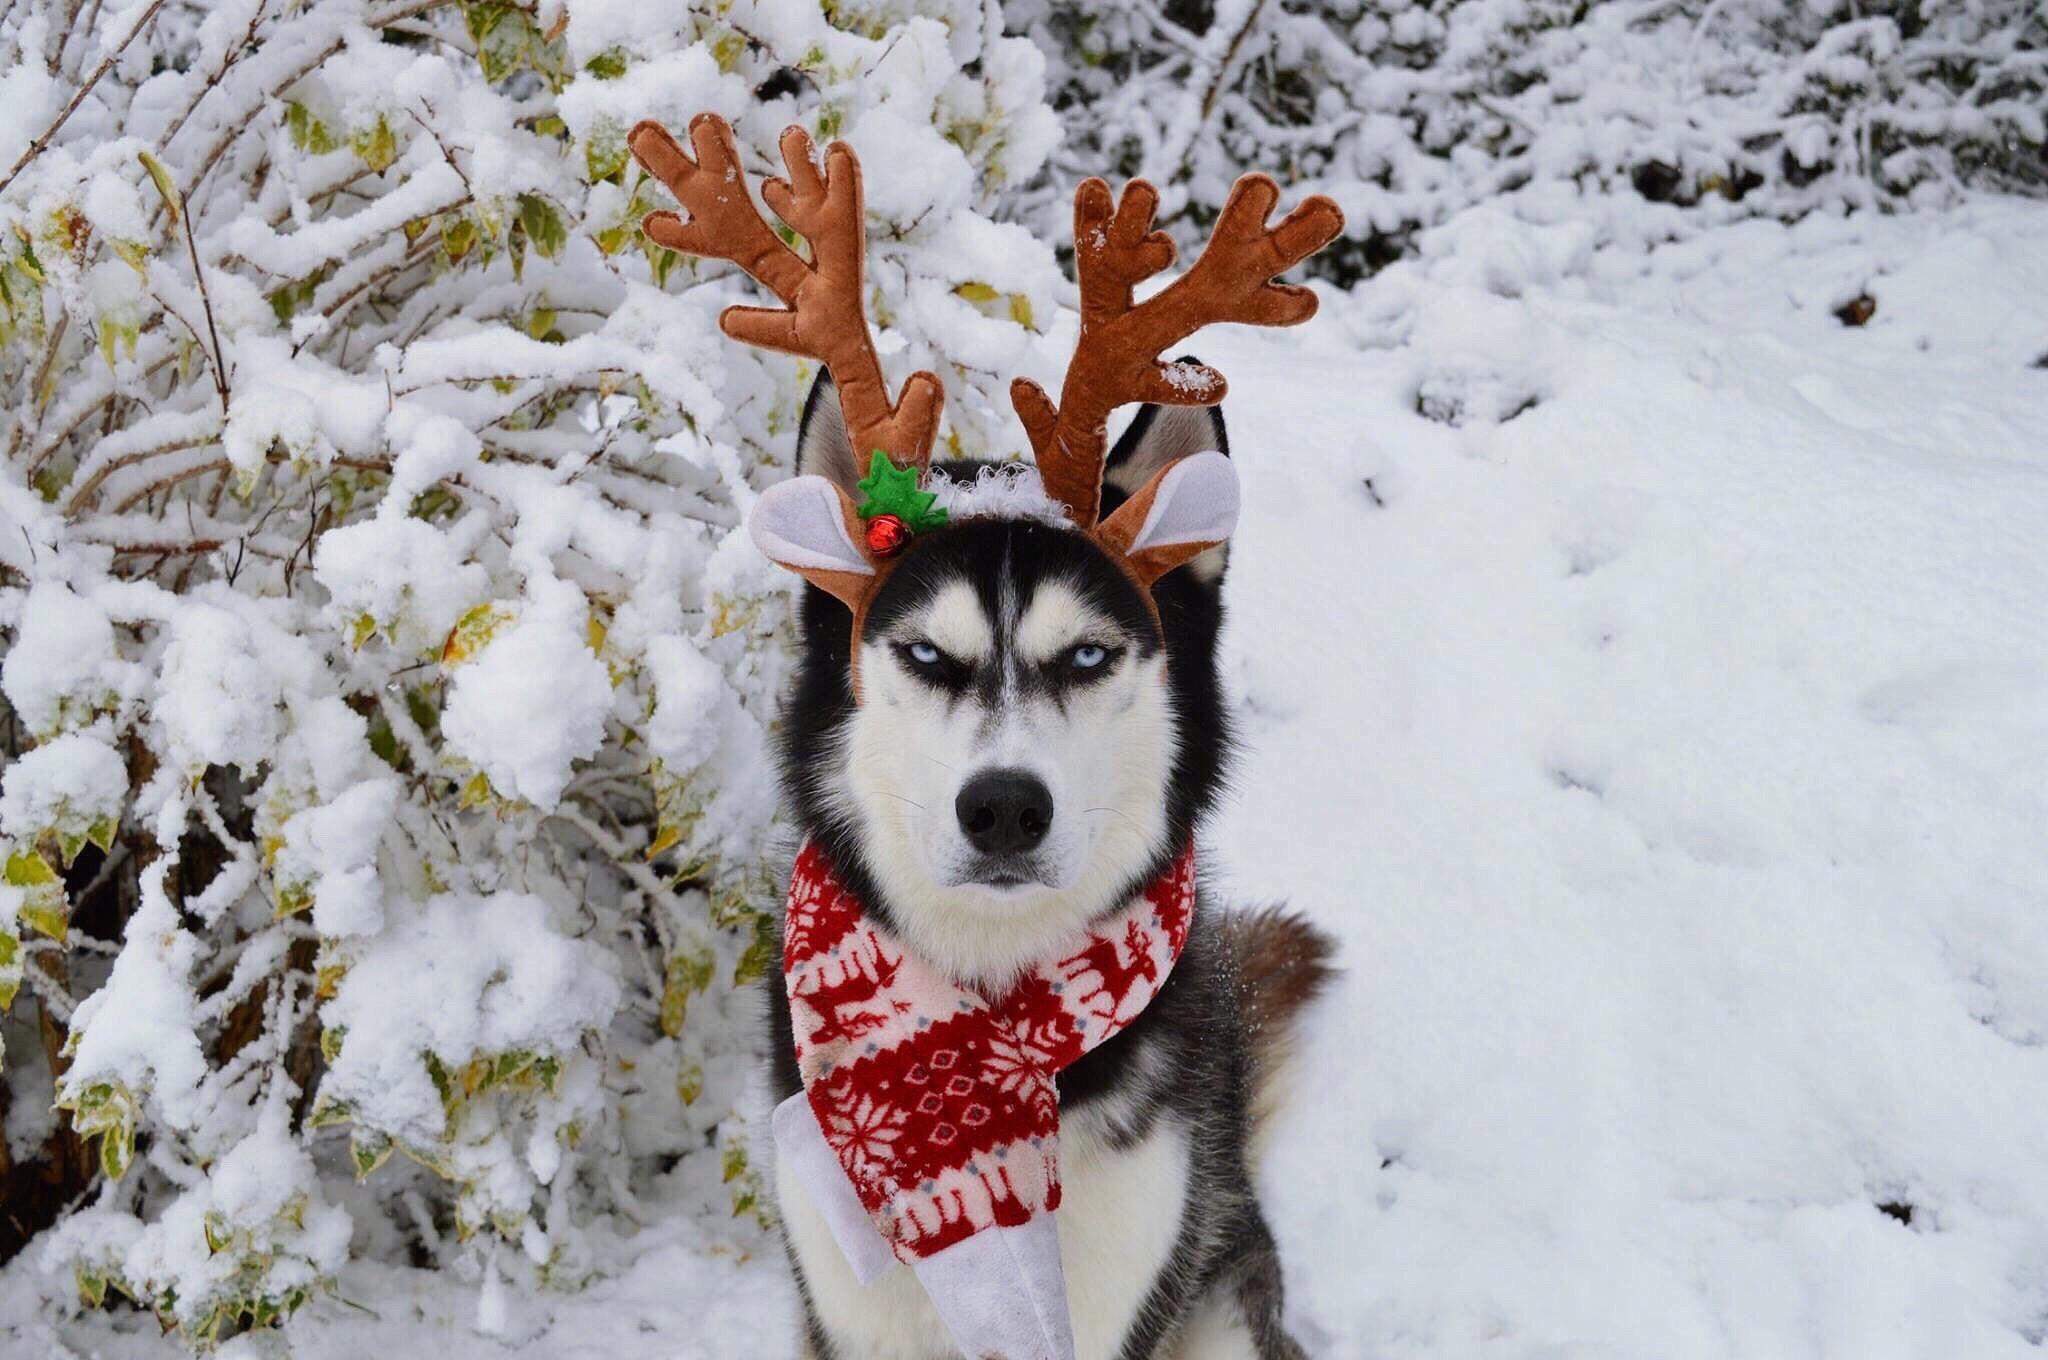 Anuko the husky